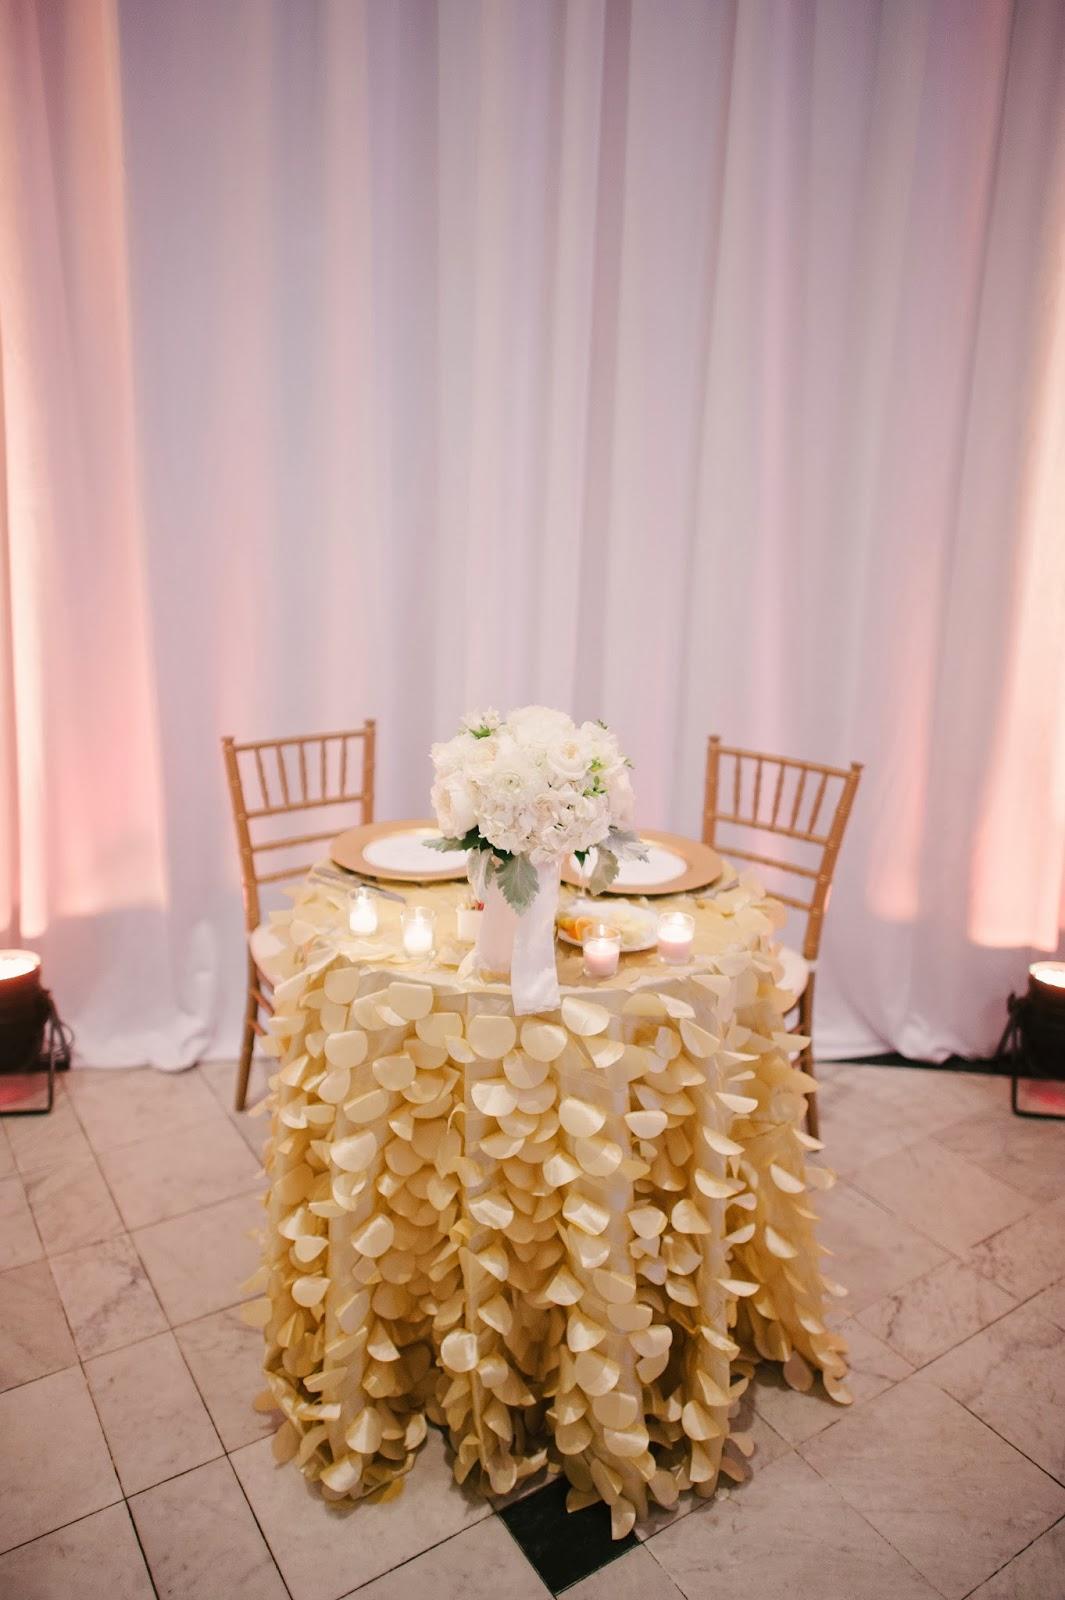 At Last Wedding Event Design November